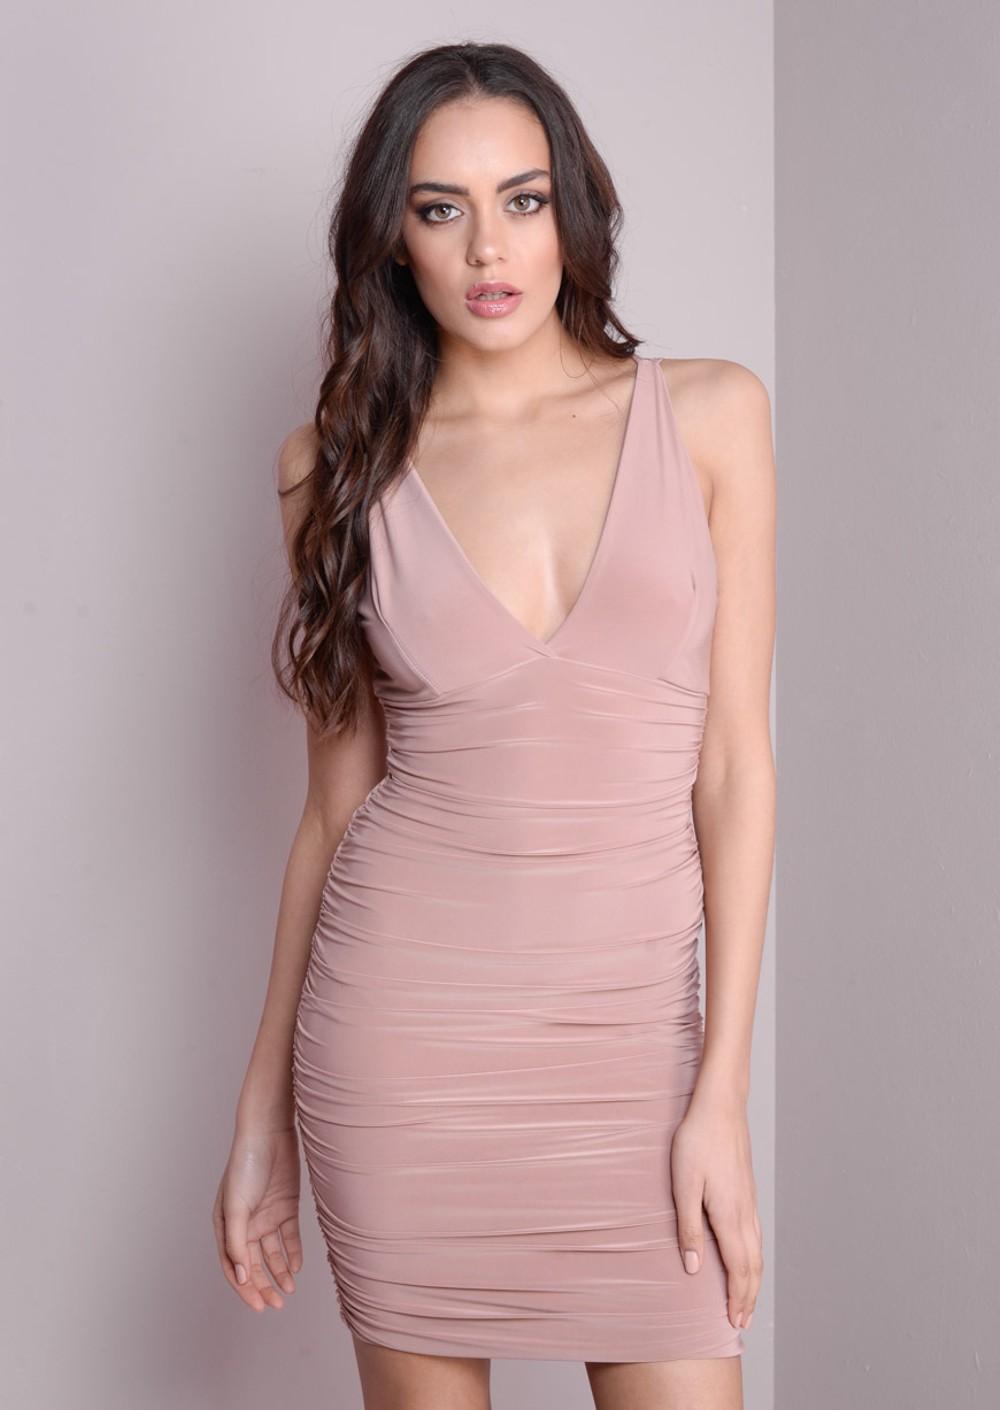 Deep V-Neck Flattering Bodycon Dress Nude